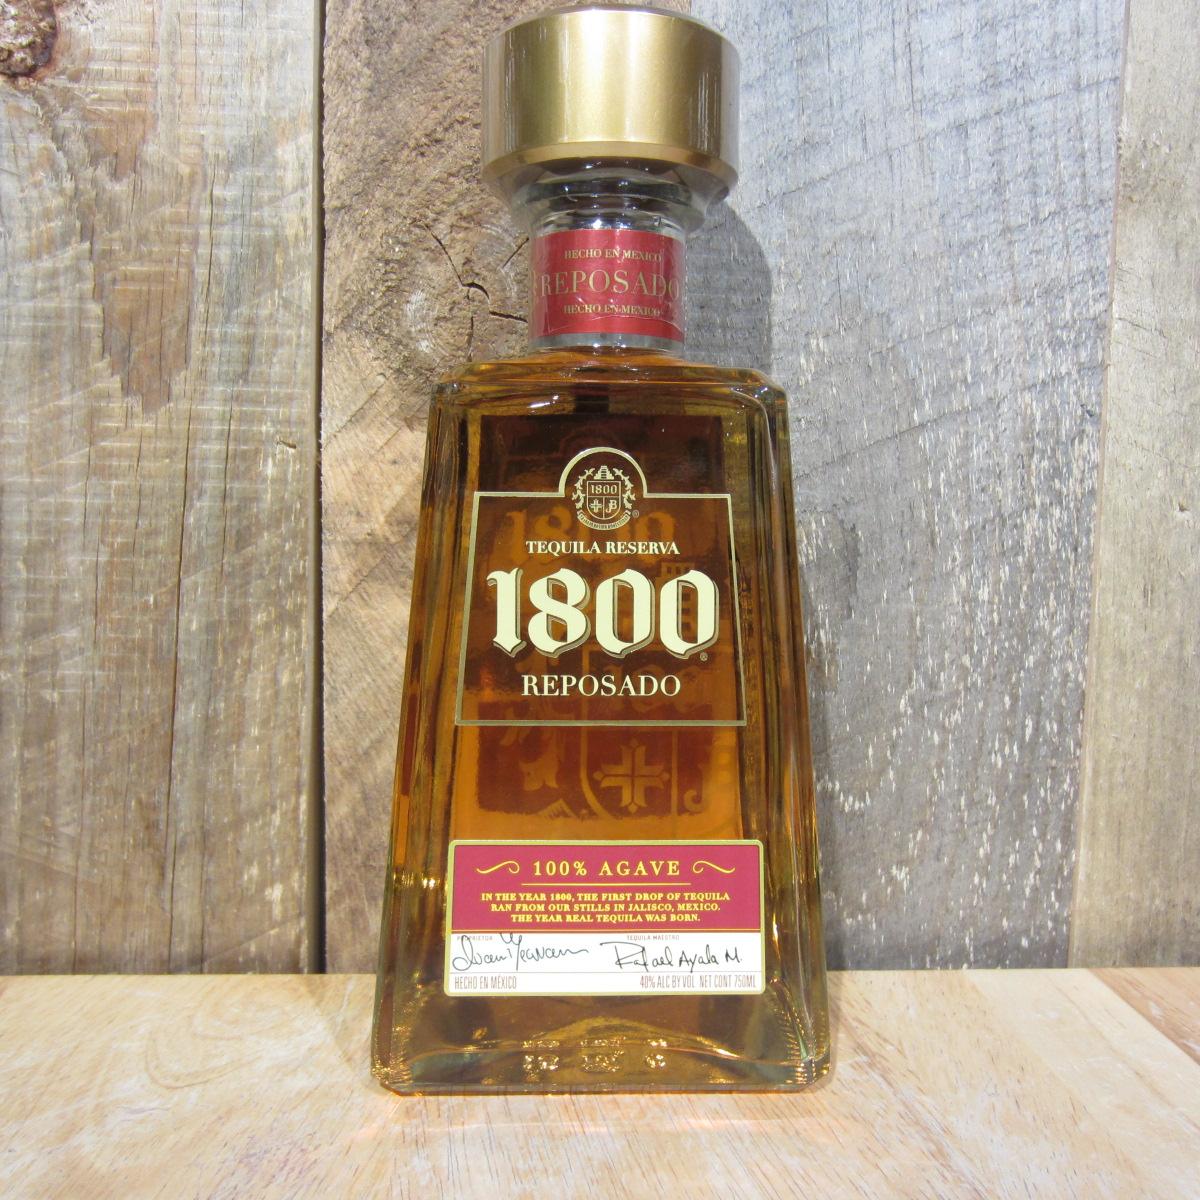 1800 REPOSADO TEQUILA 750ML - Oak and Barrel